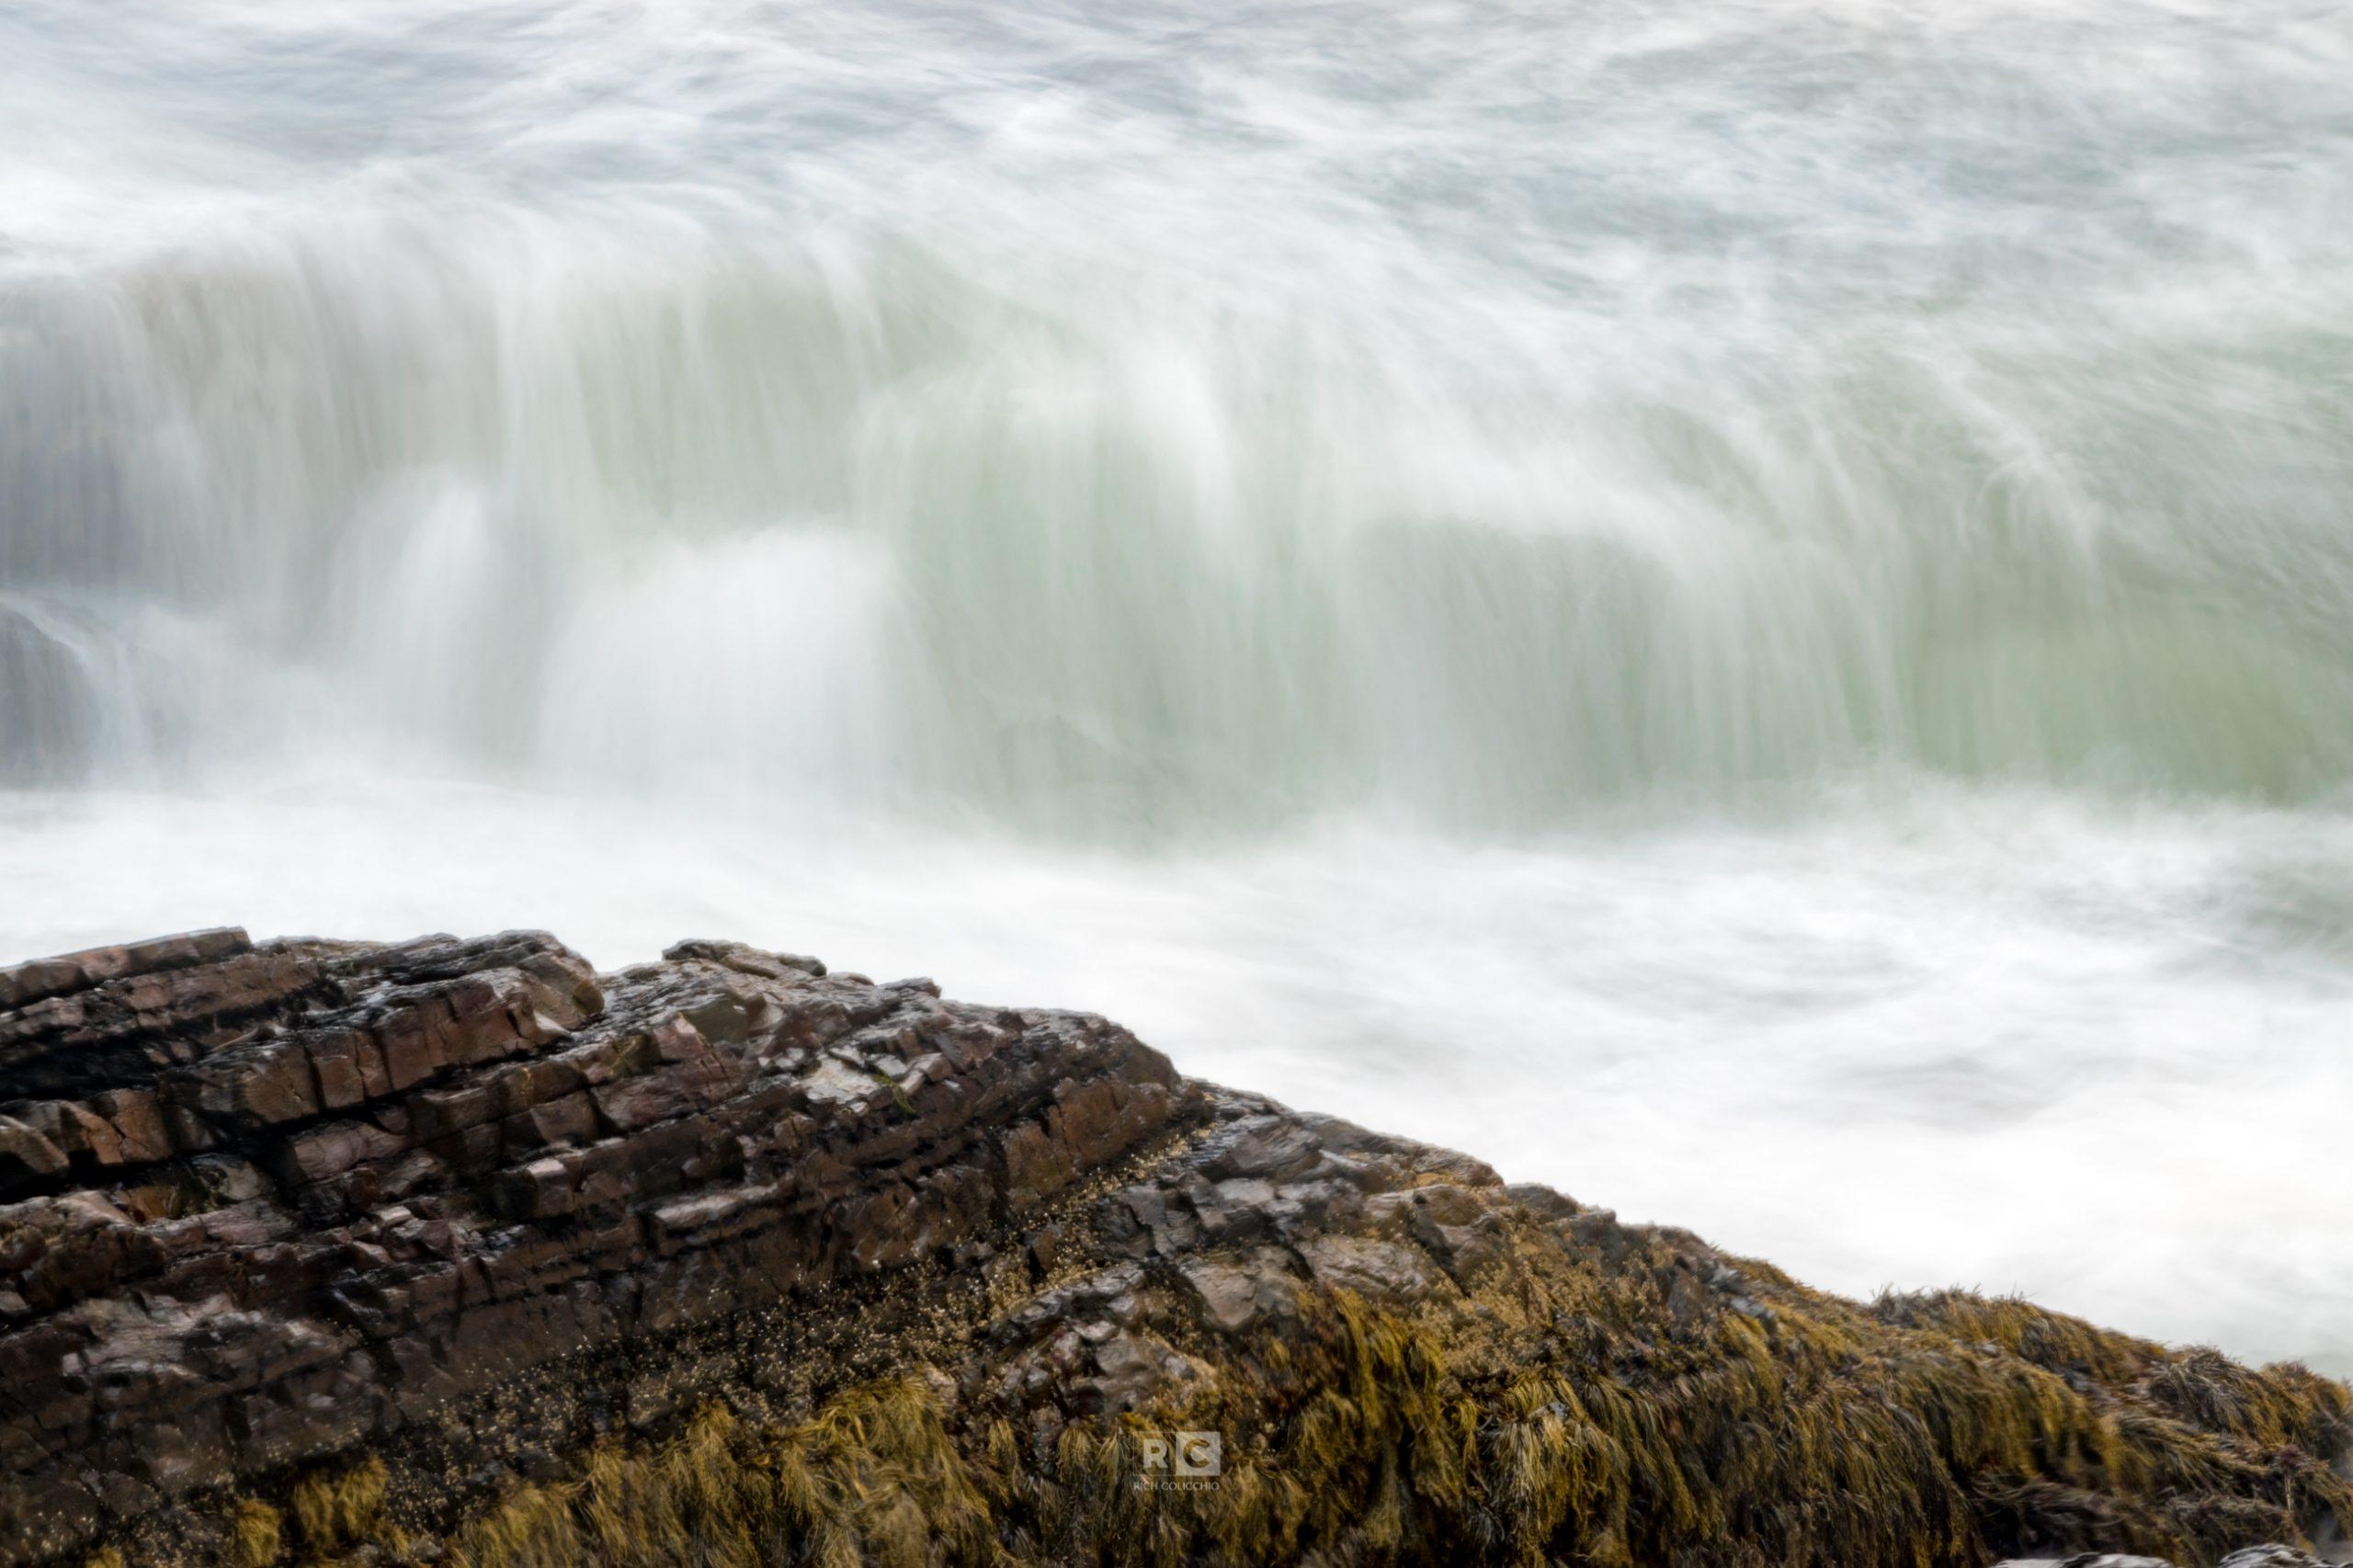 Water concealing the rocks